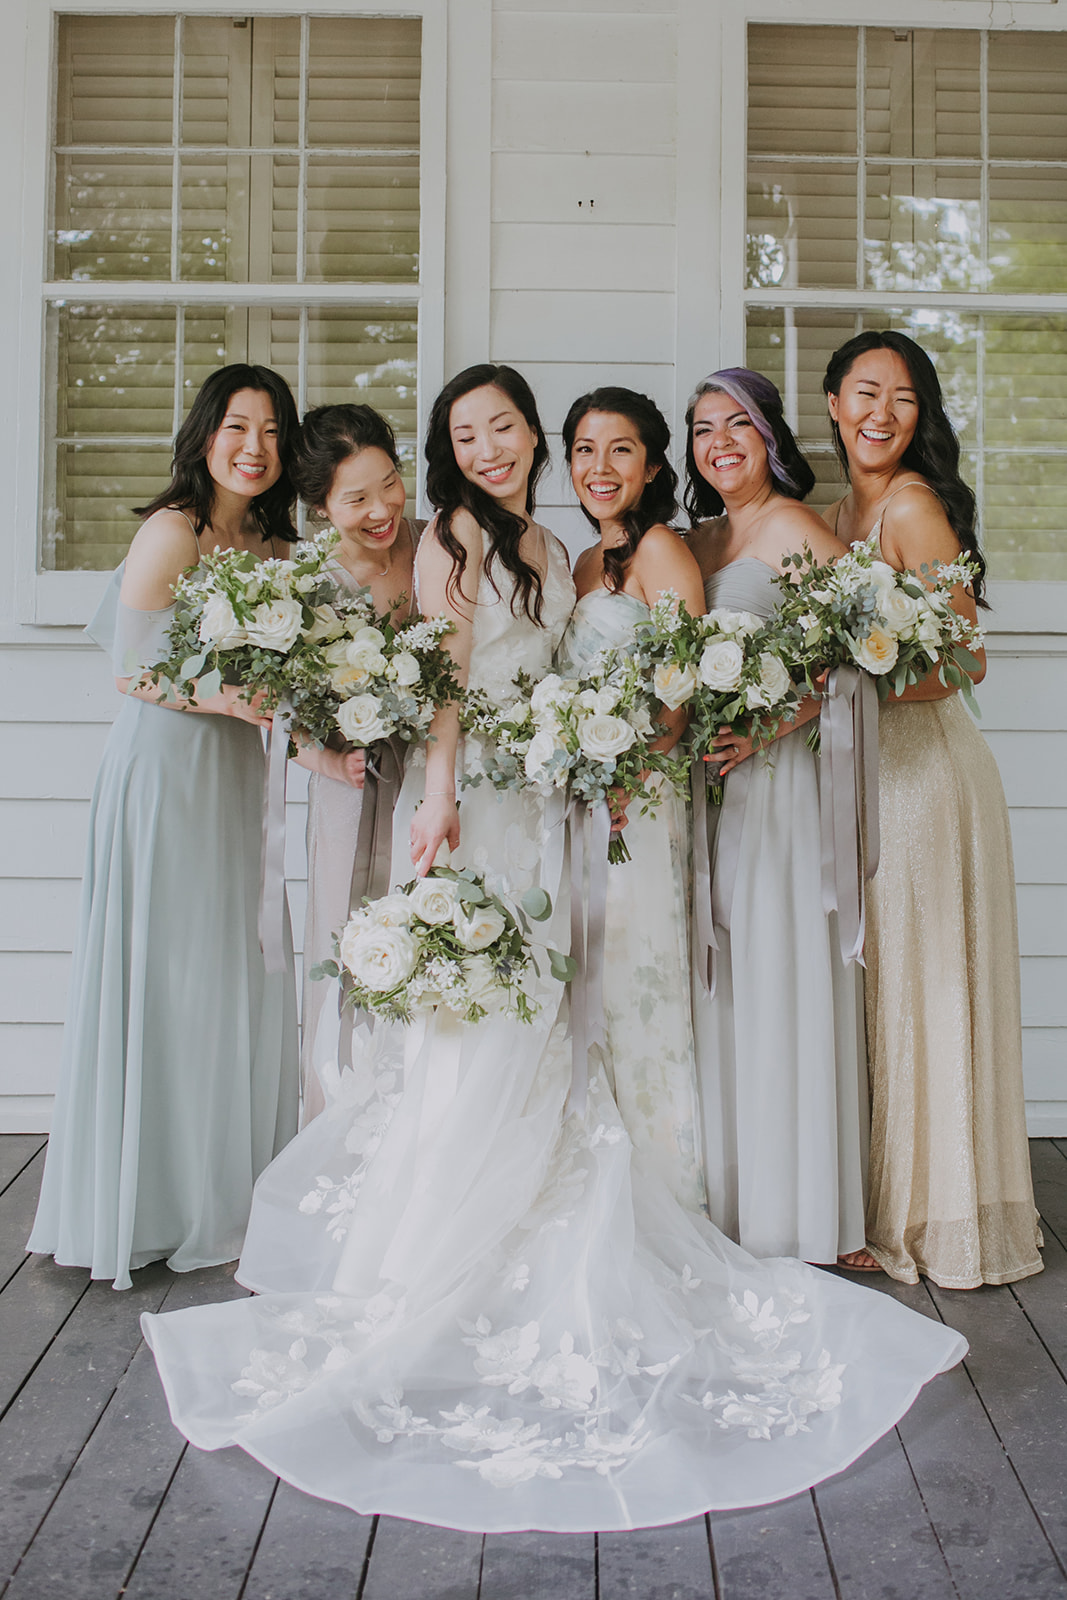 Pastel bridesmaids dresses: Summer Soiree at Cedarwood Weddings featured on Nashville Bride Guide